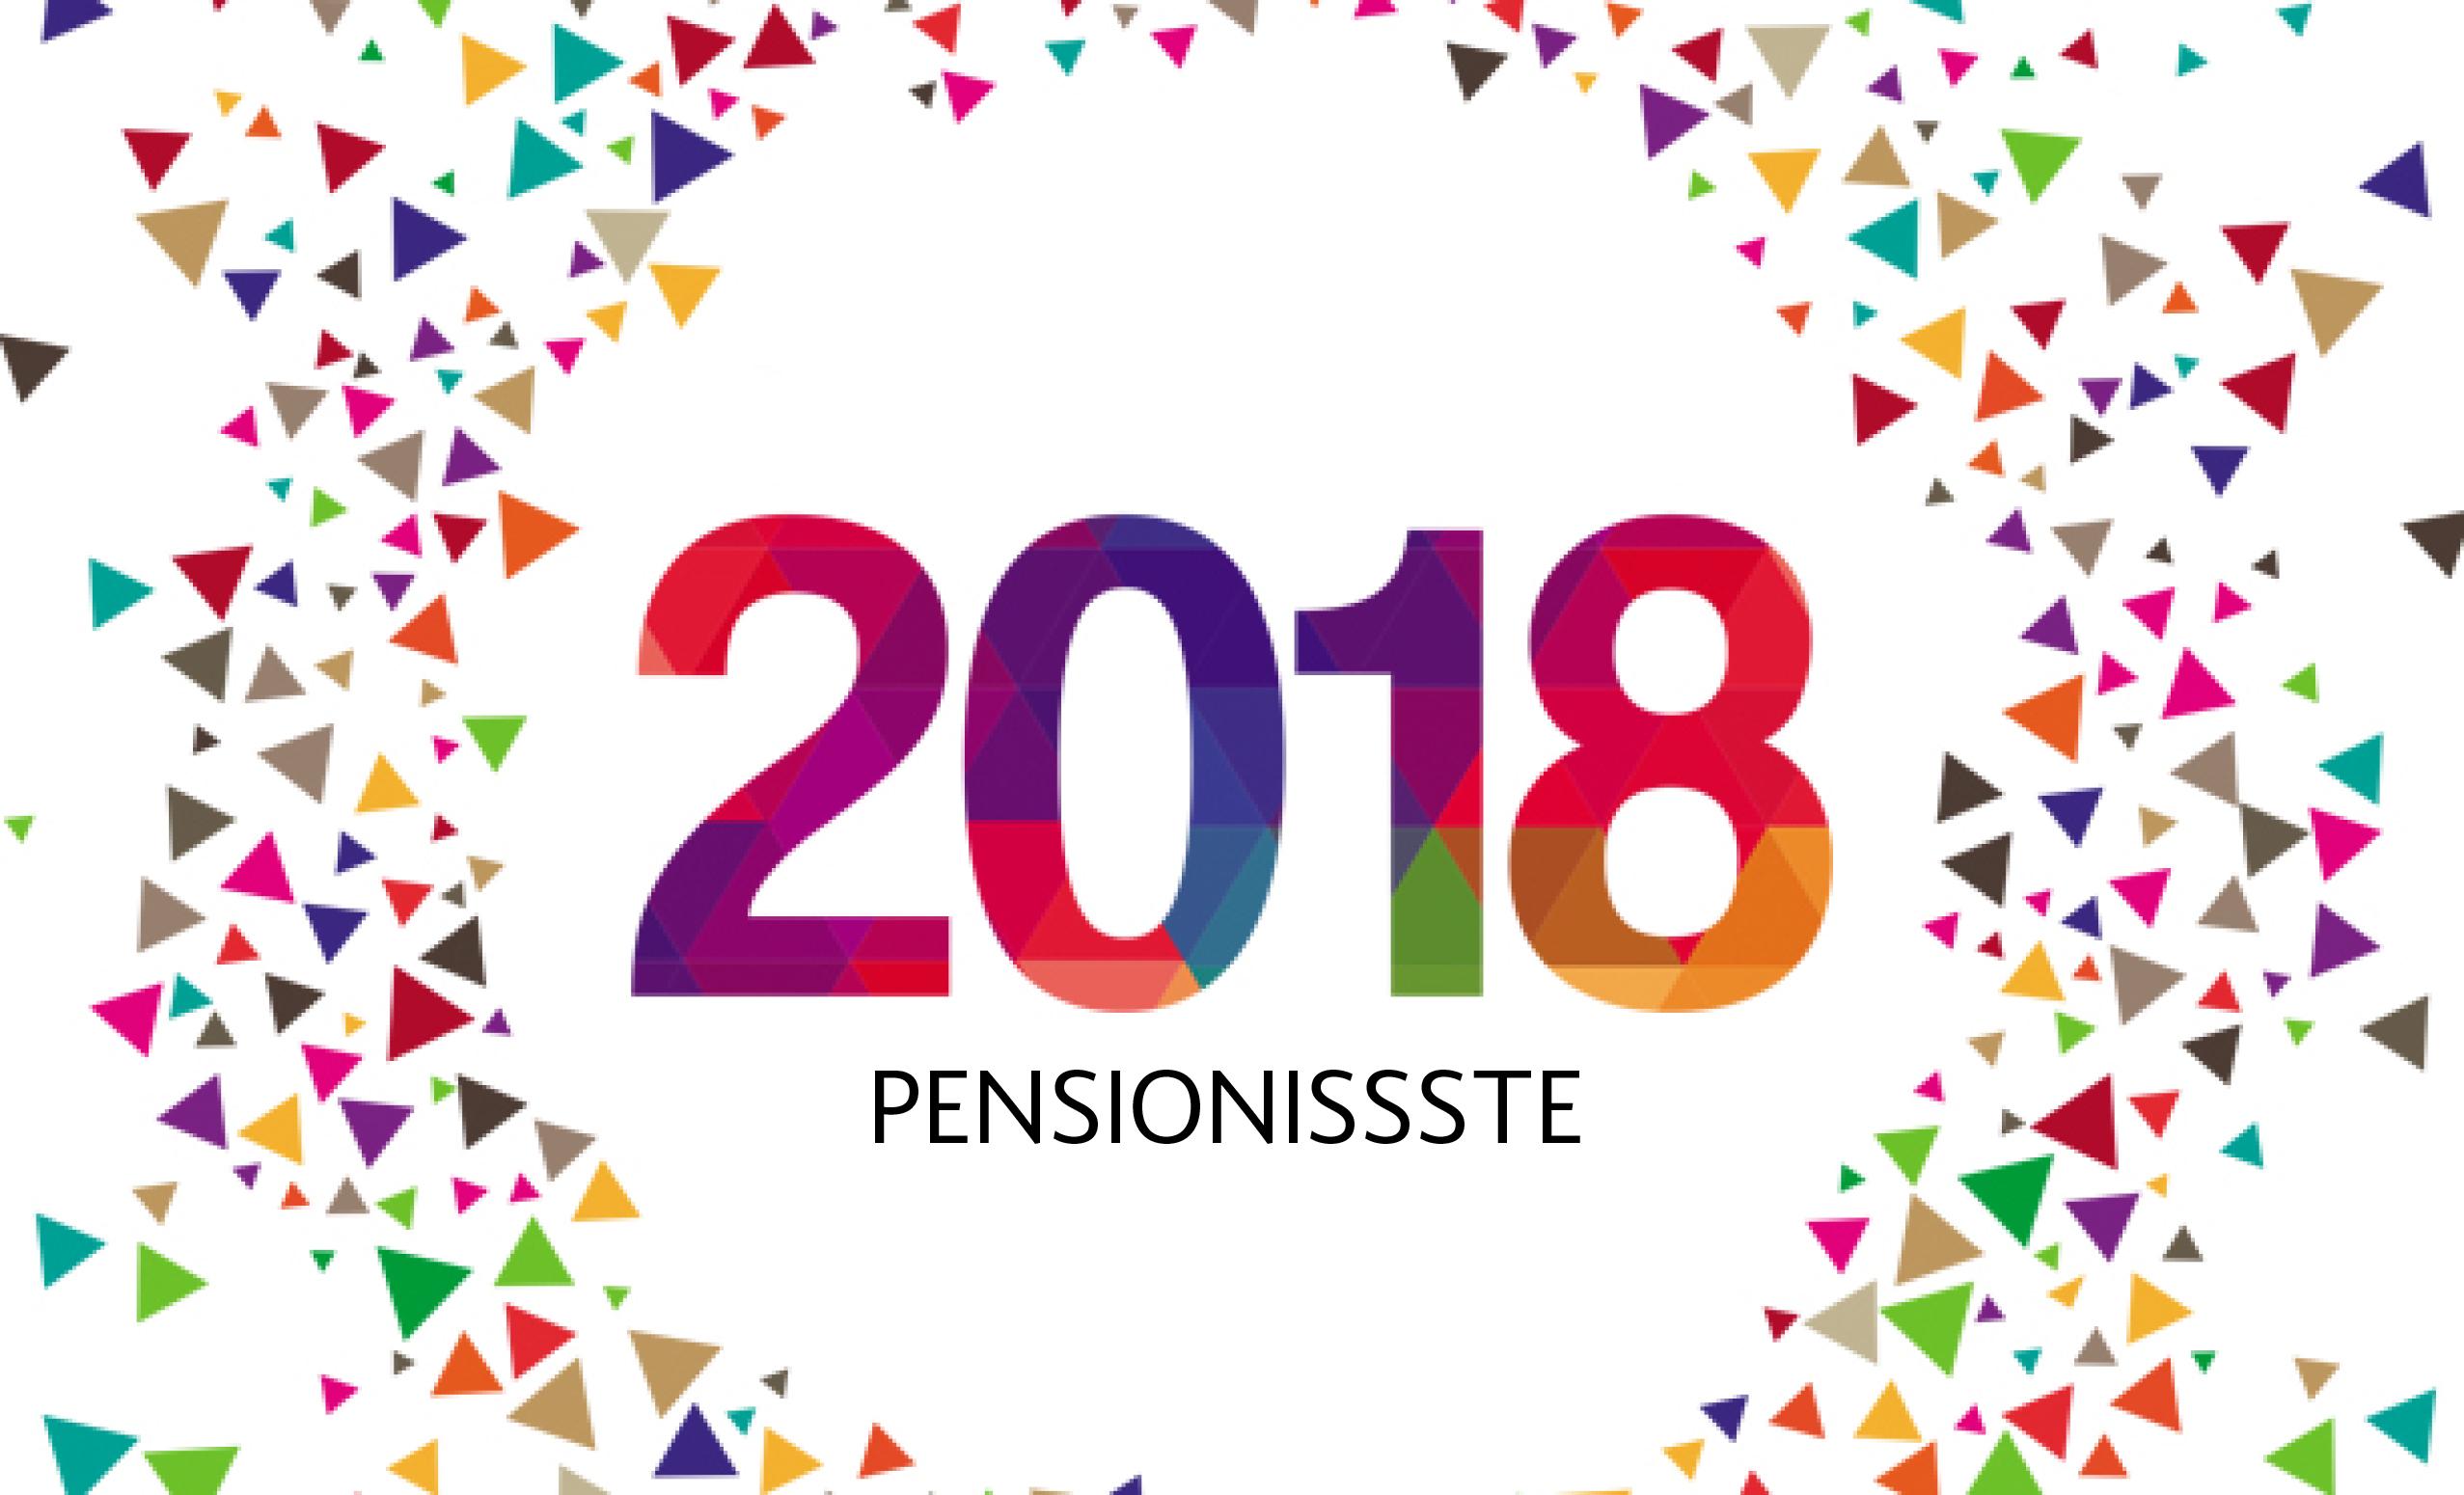 Logros 2017 PENSIONISSSTE